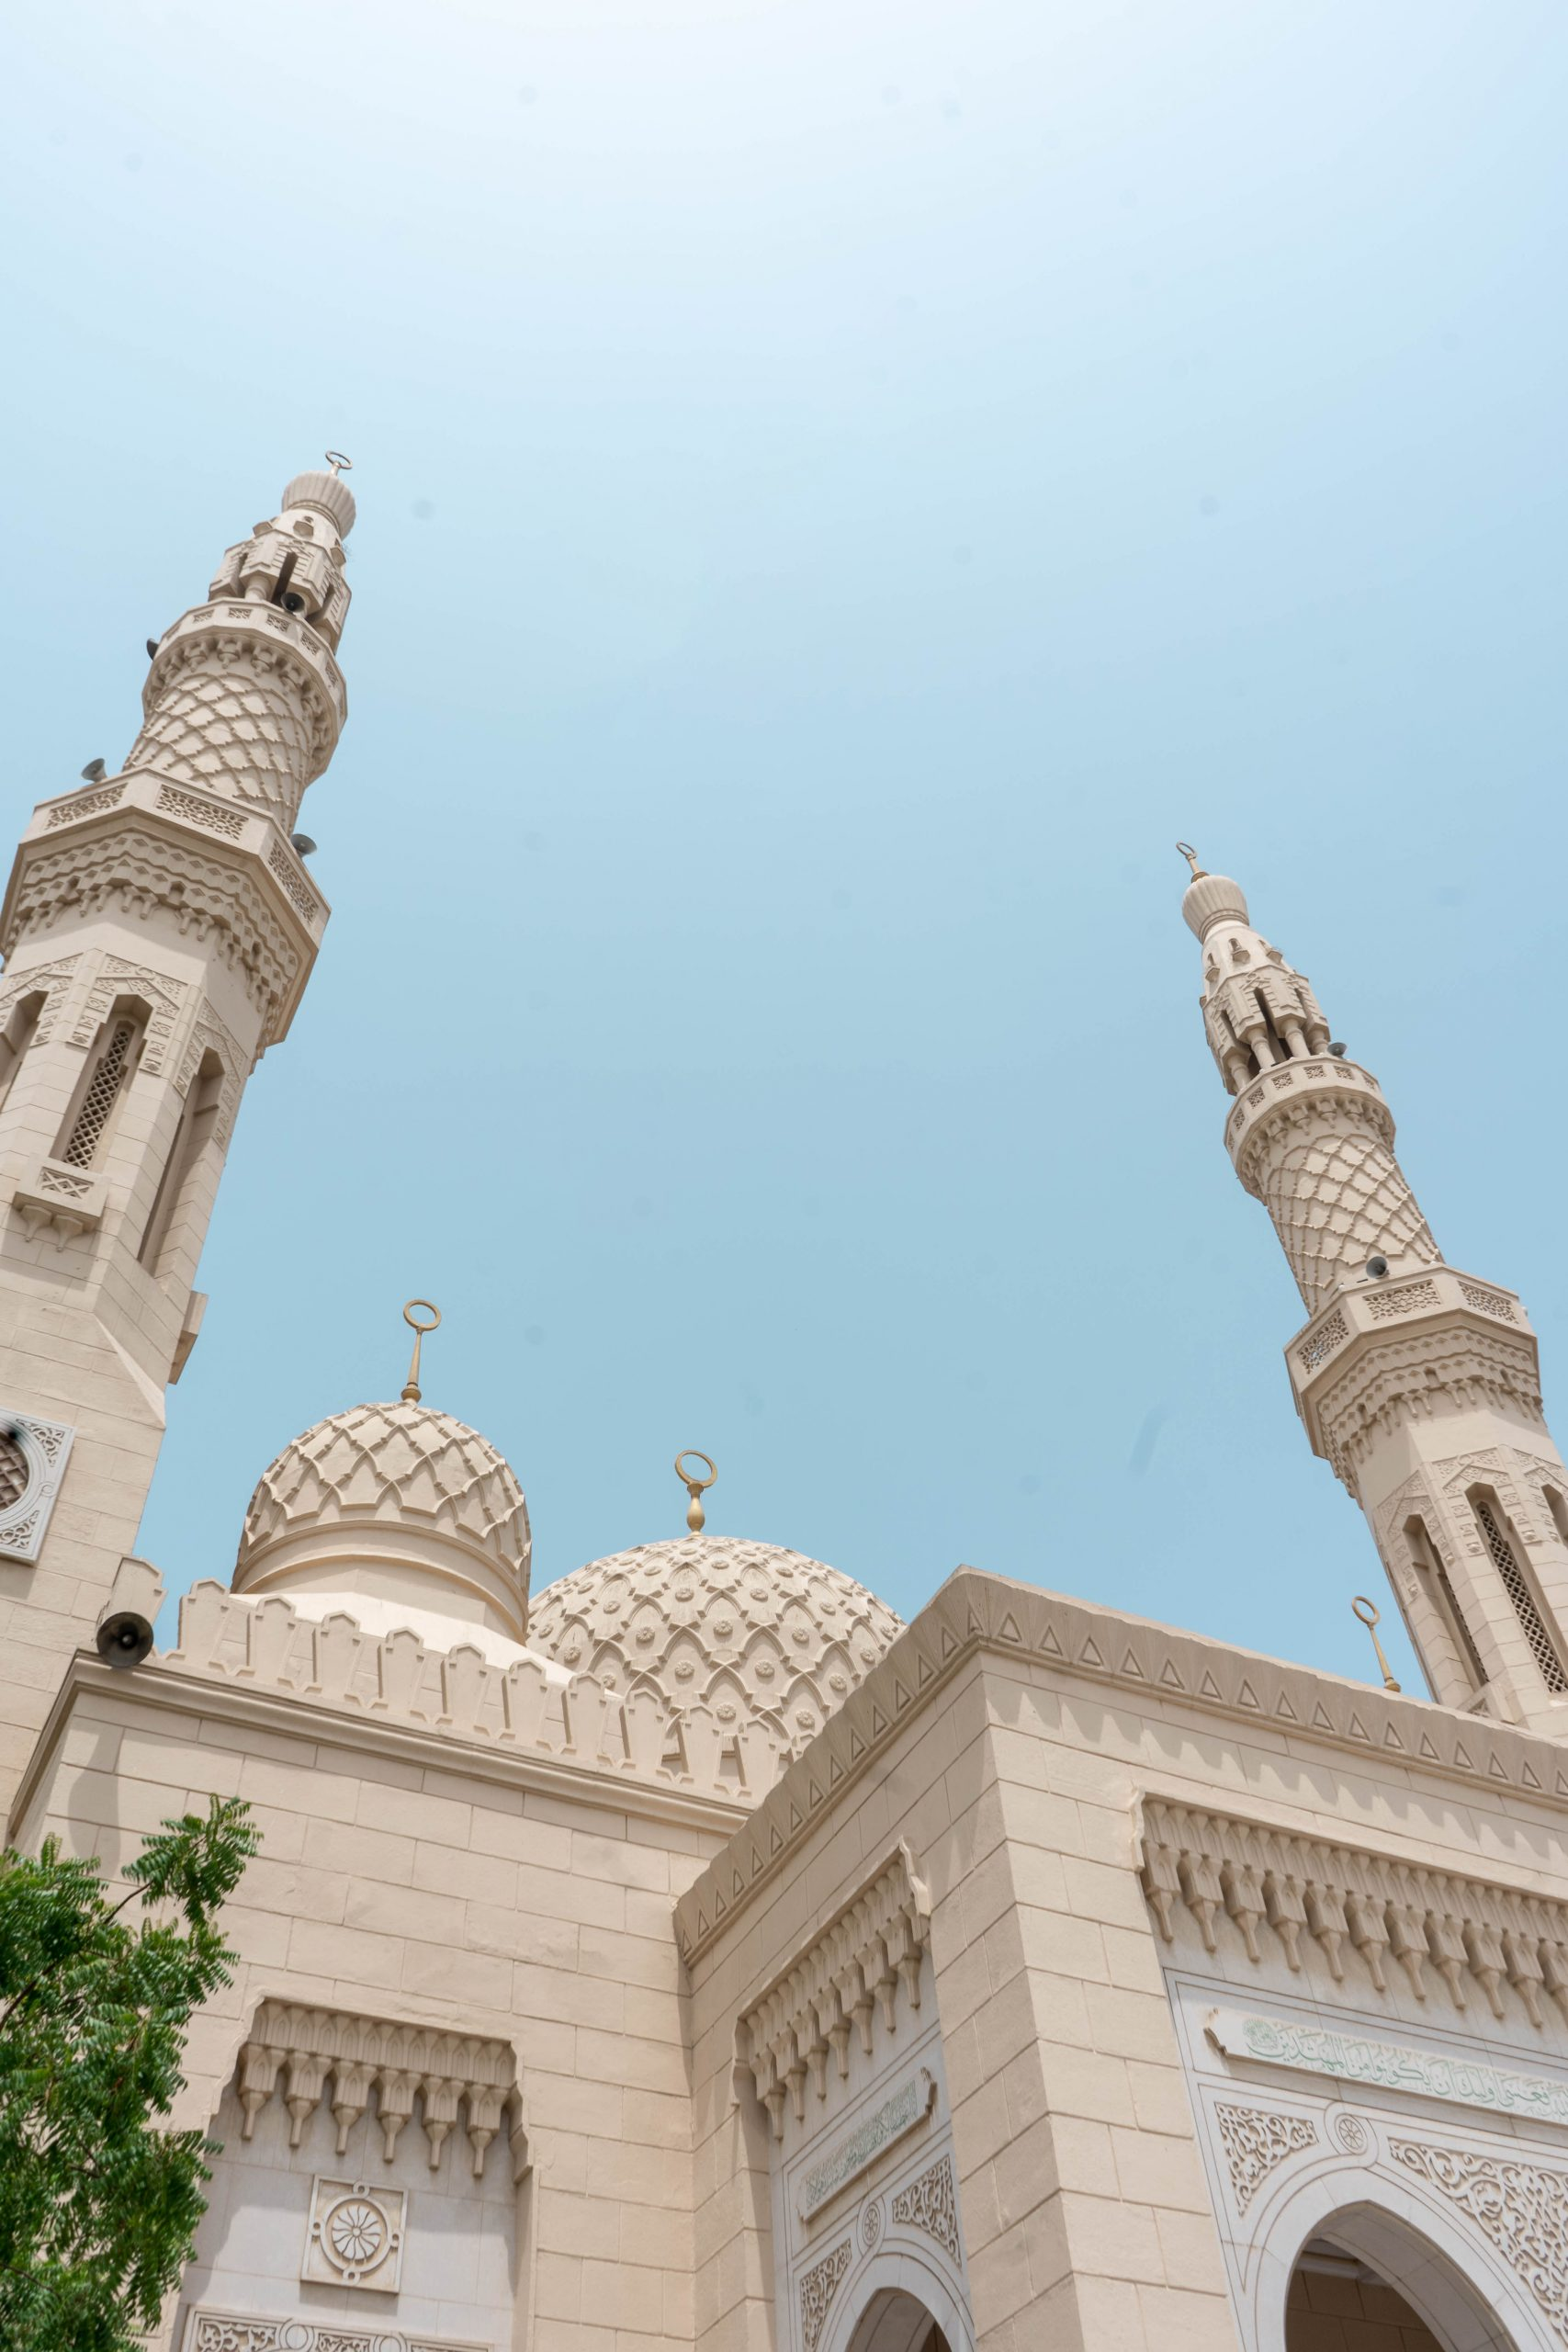 jumeirah mosque domes minaret islamic architecture fatimid